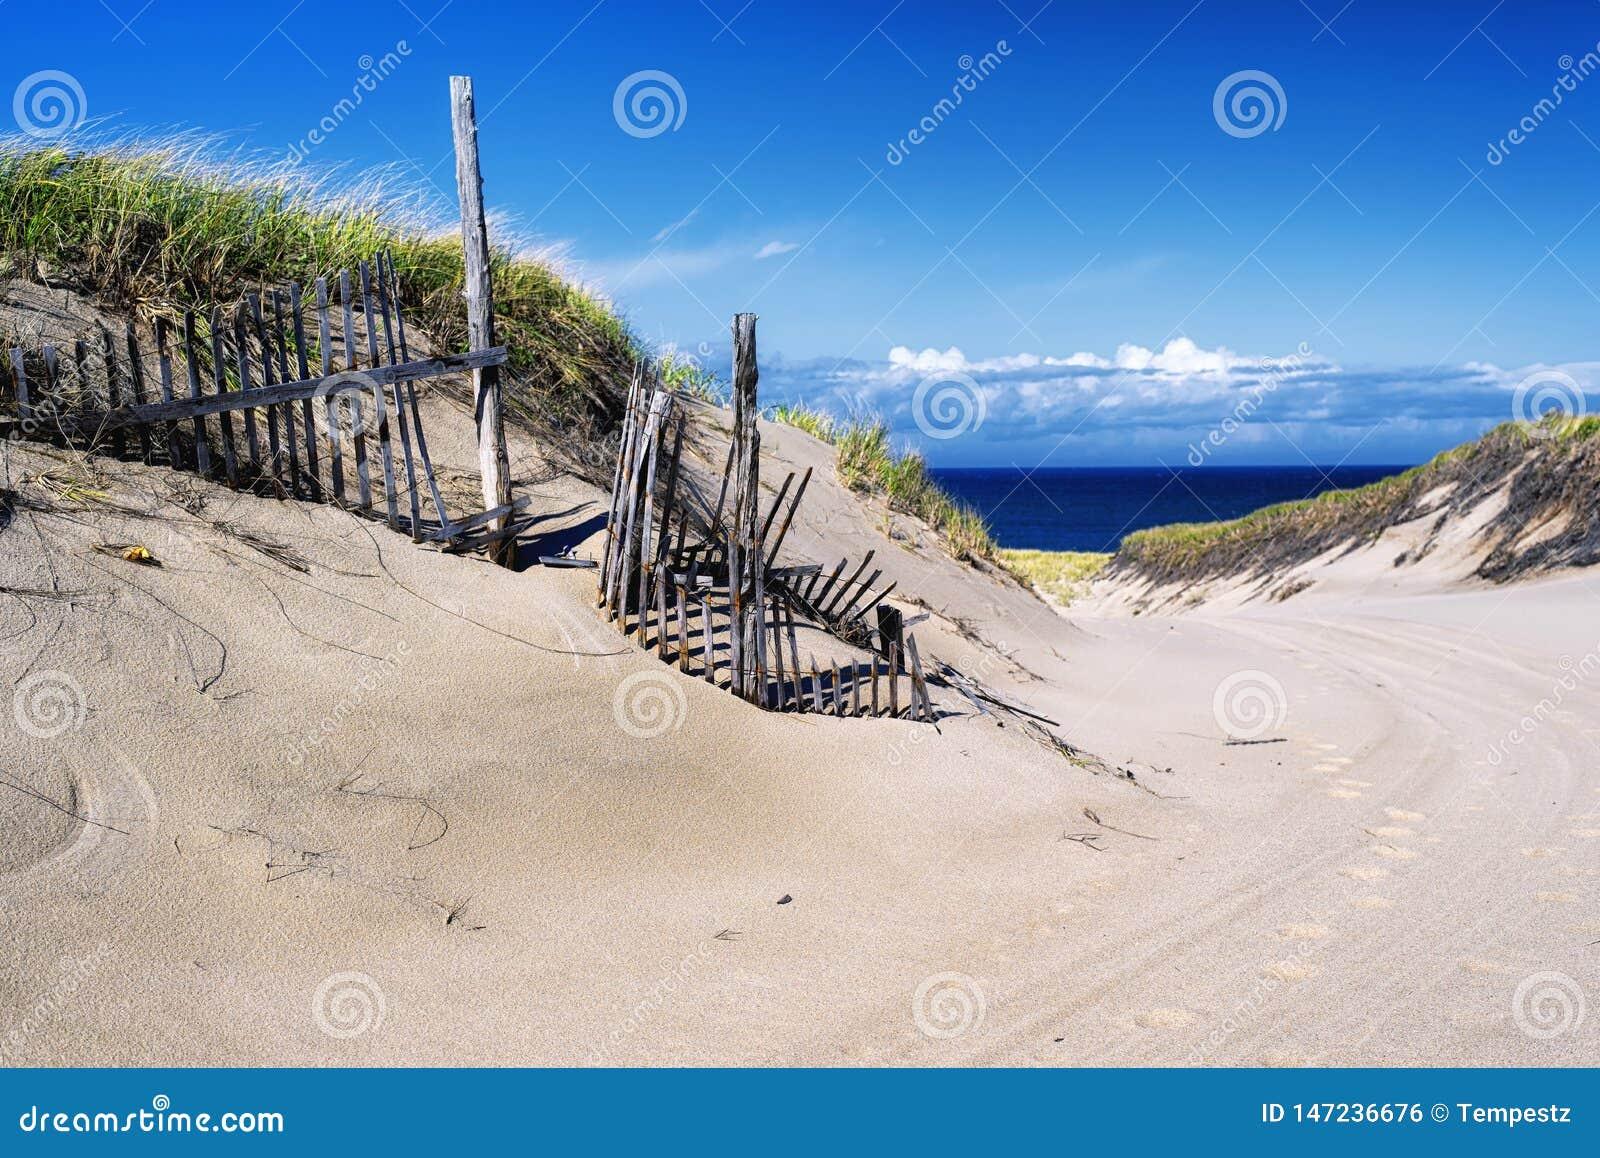 Cape Cod National Seashore Nature landscape